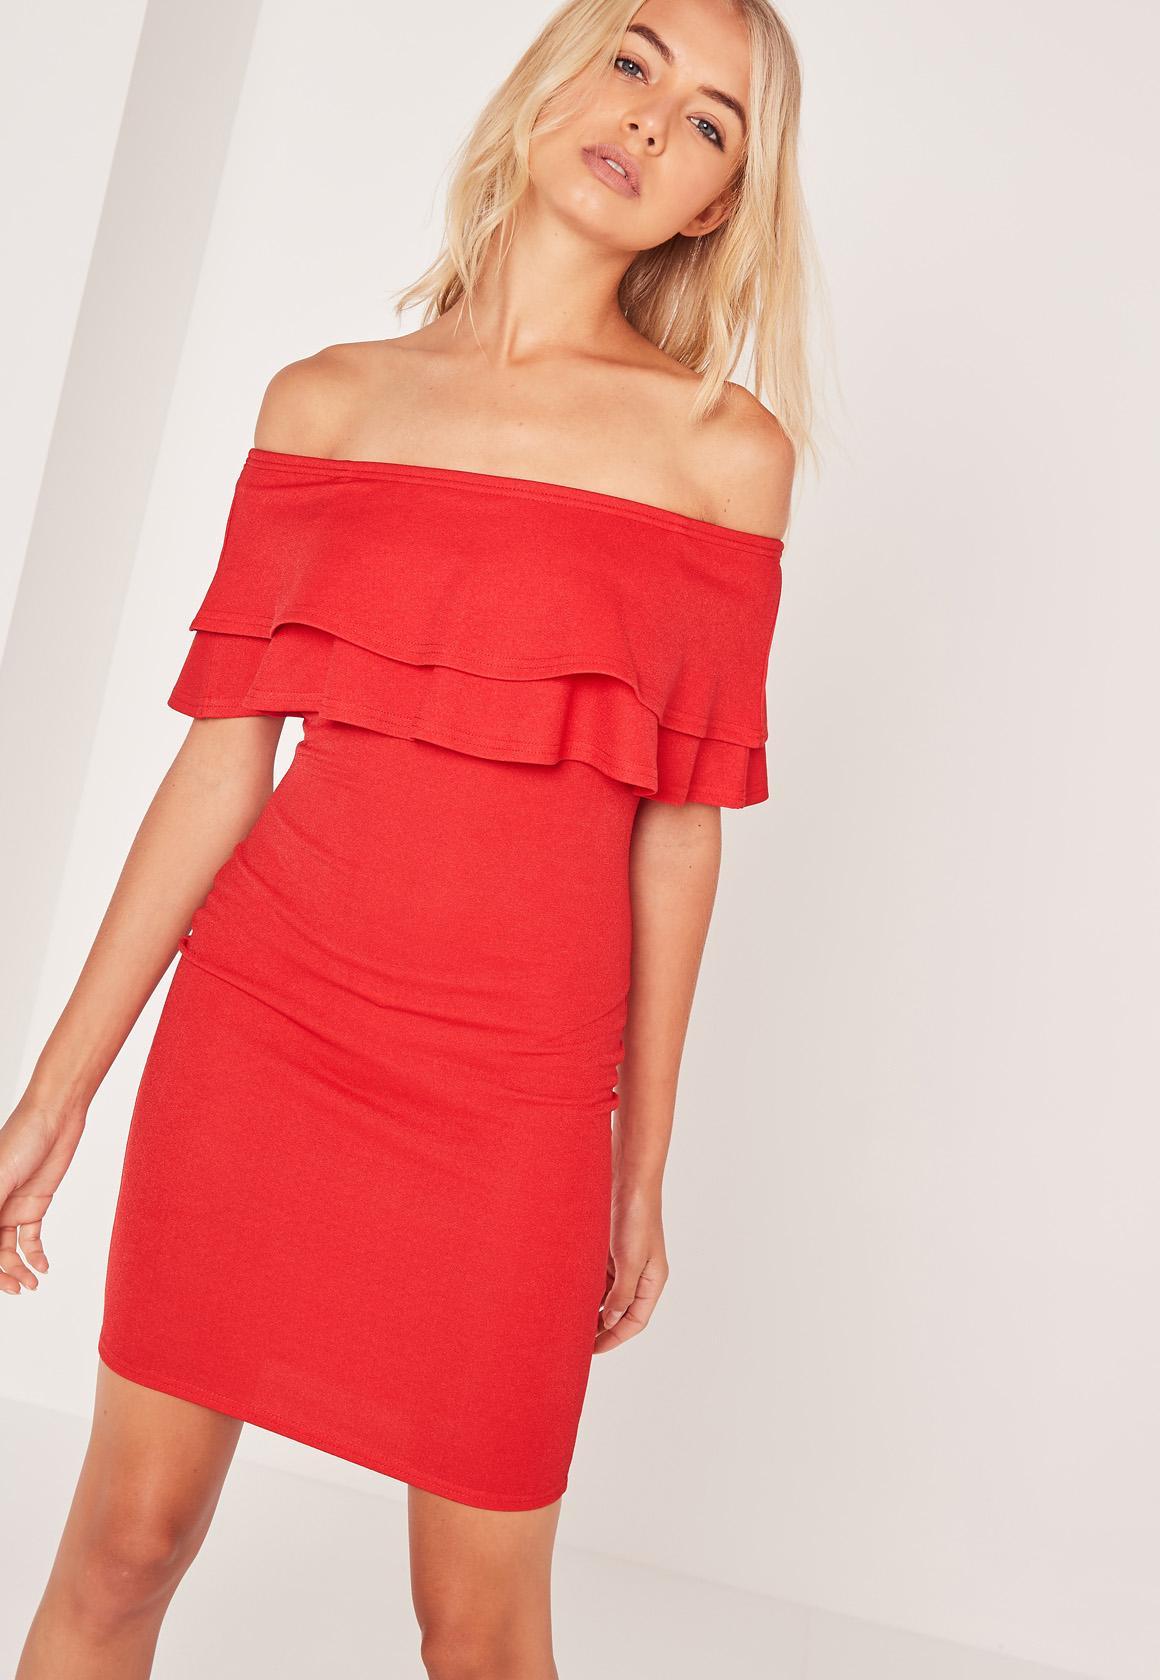 Bandeau & Strapless Dresses Online - Missguided